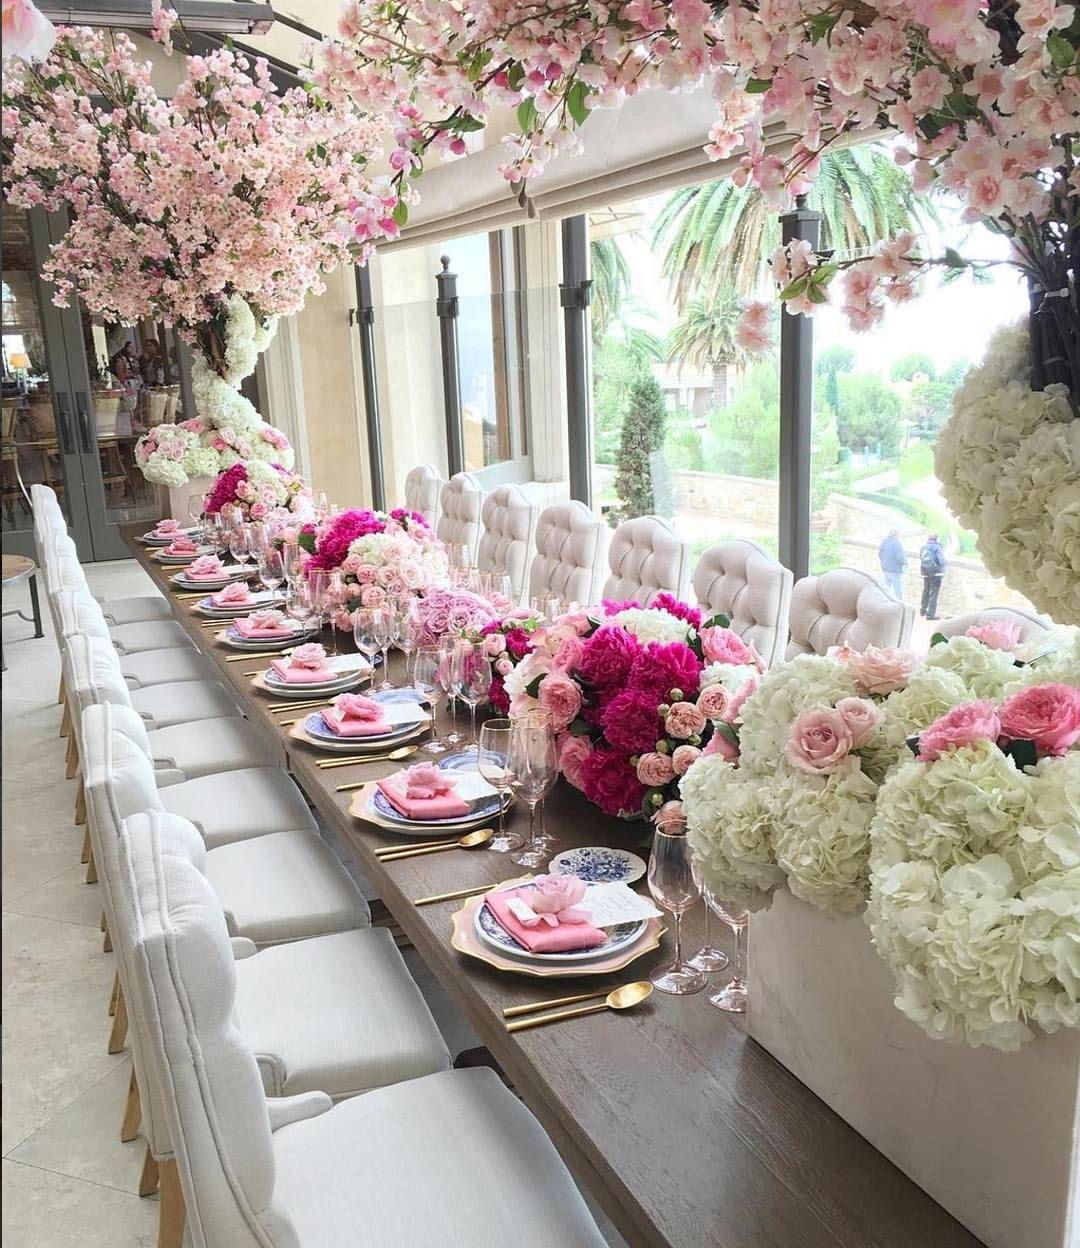 Pastel Pretty Wedding Image By Jennifer Lilley